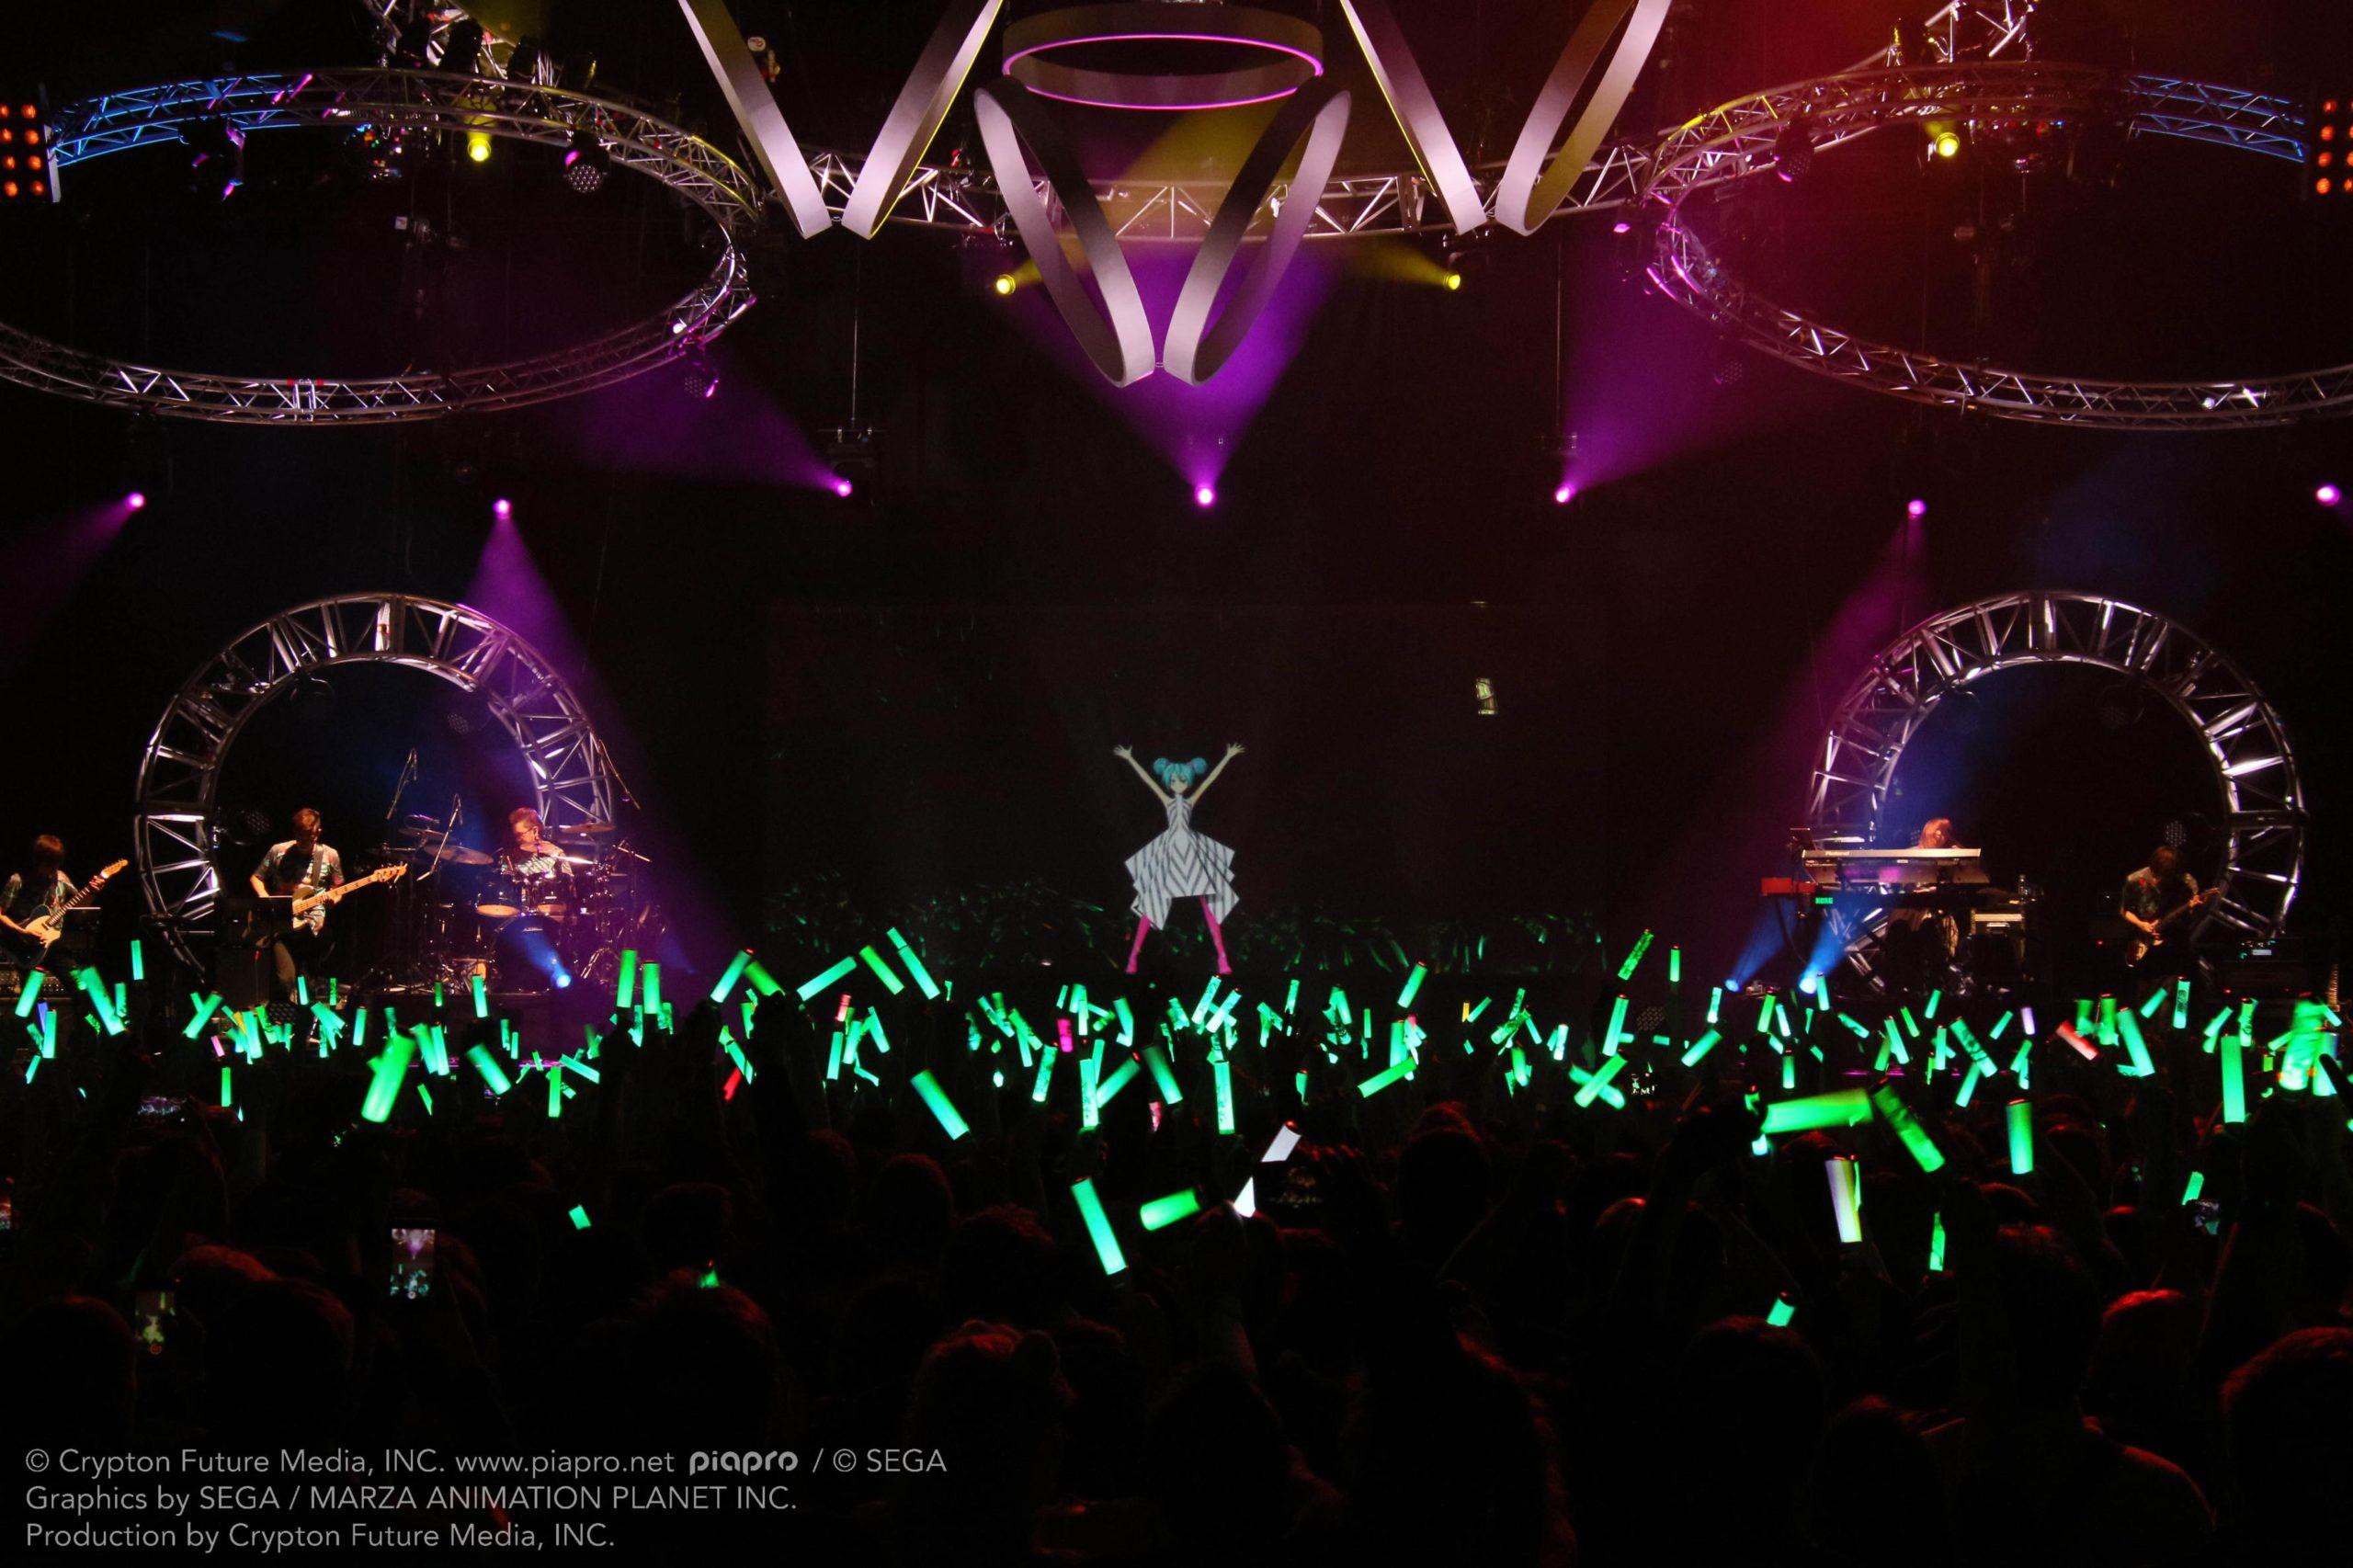 Concert d'Hatsune Miku à la Seine Musicale